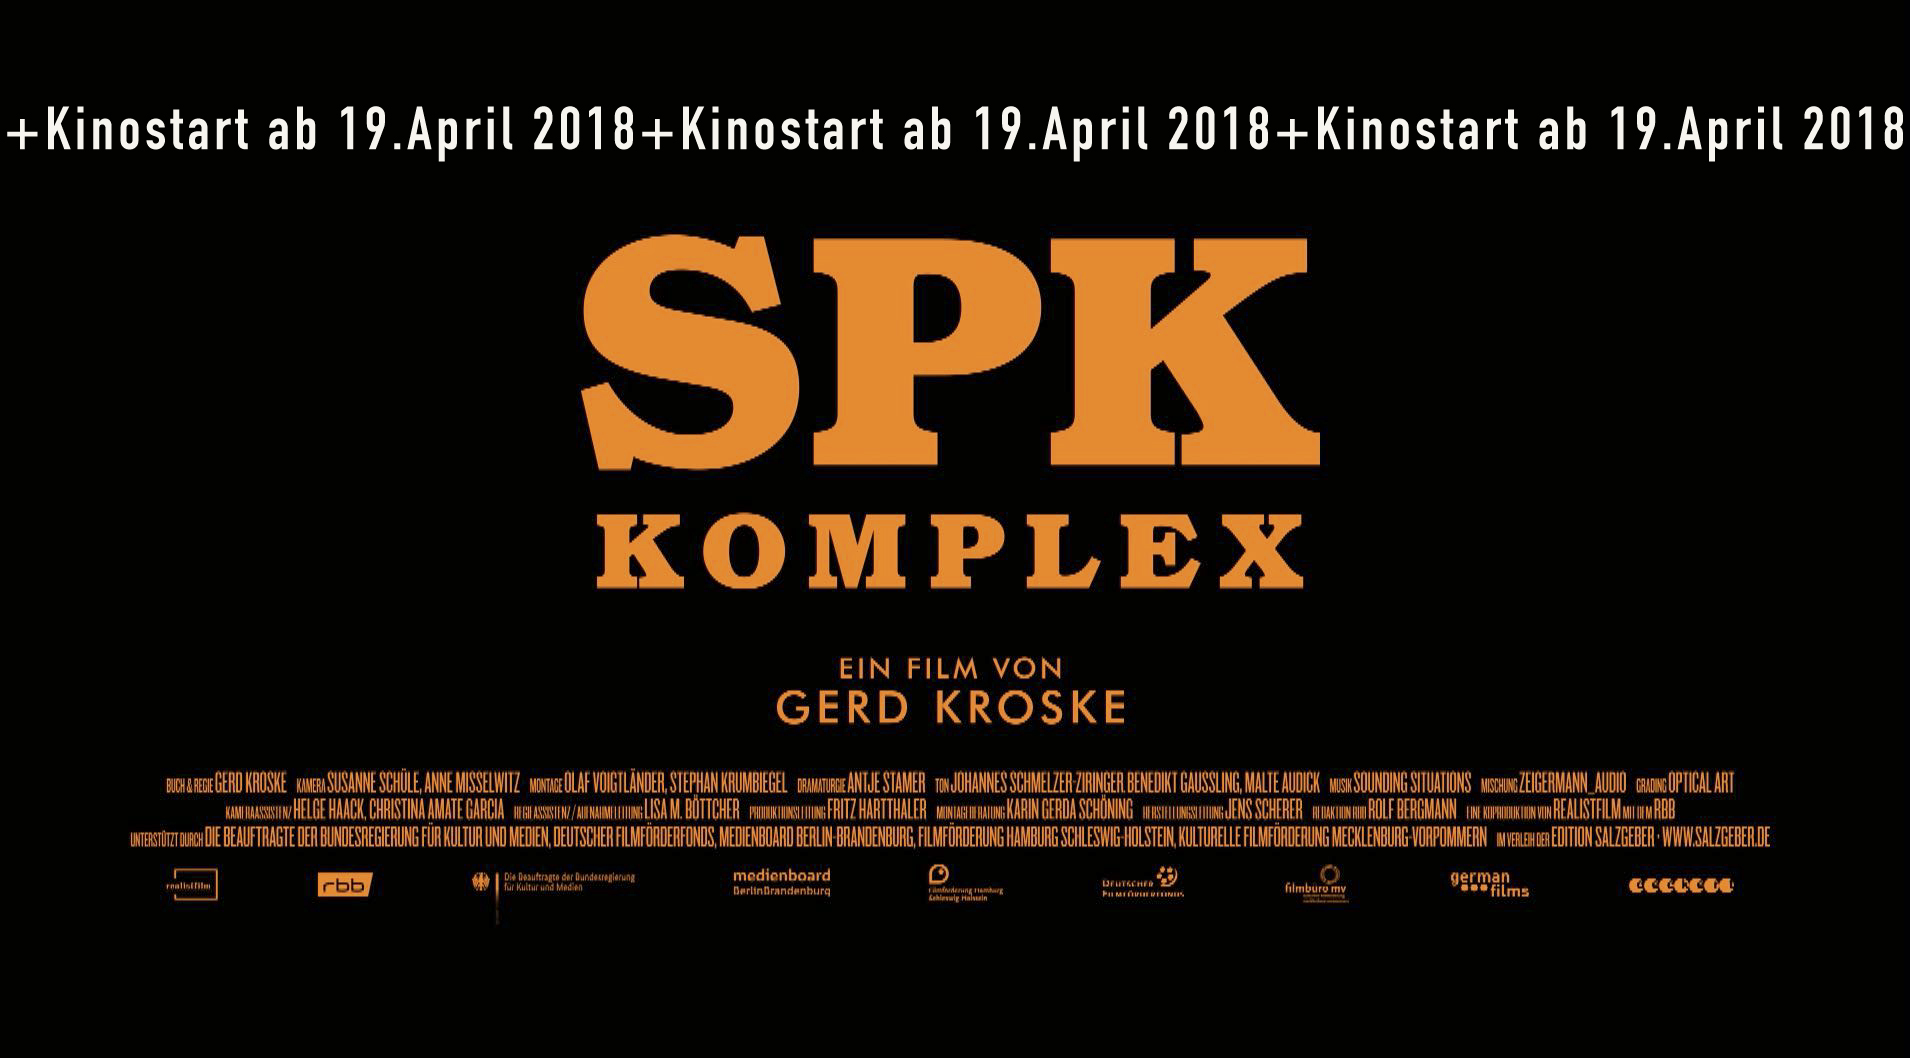 http://realistfilm.de/wp-content/uploads/2018/04/pic_trailerKinostart.jpg